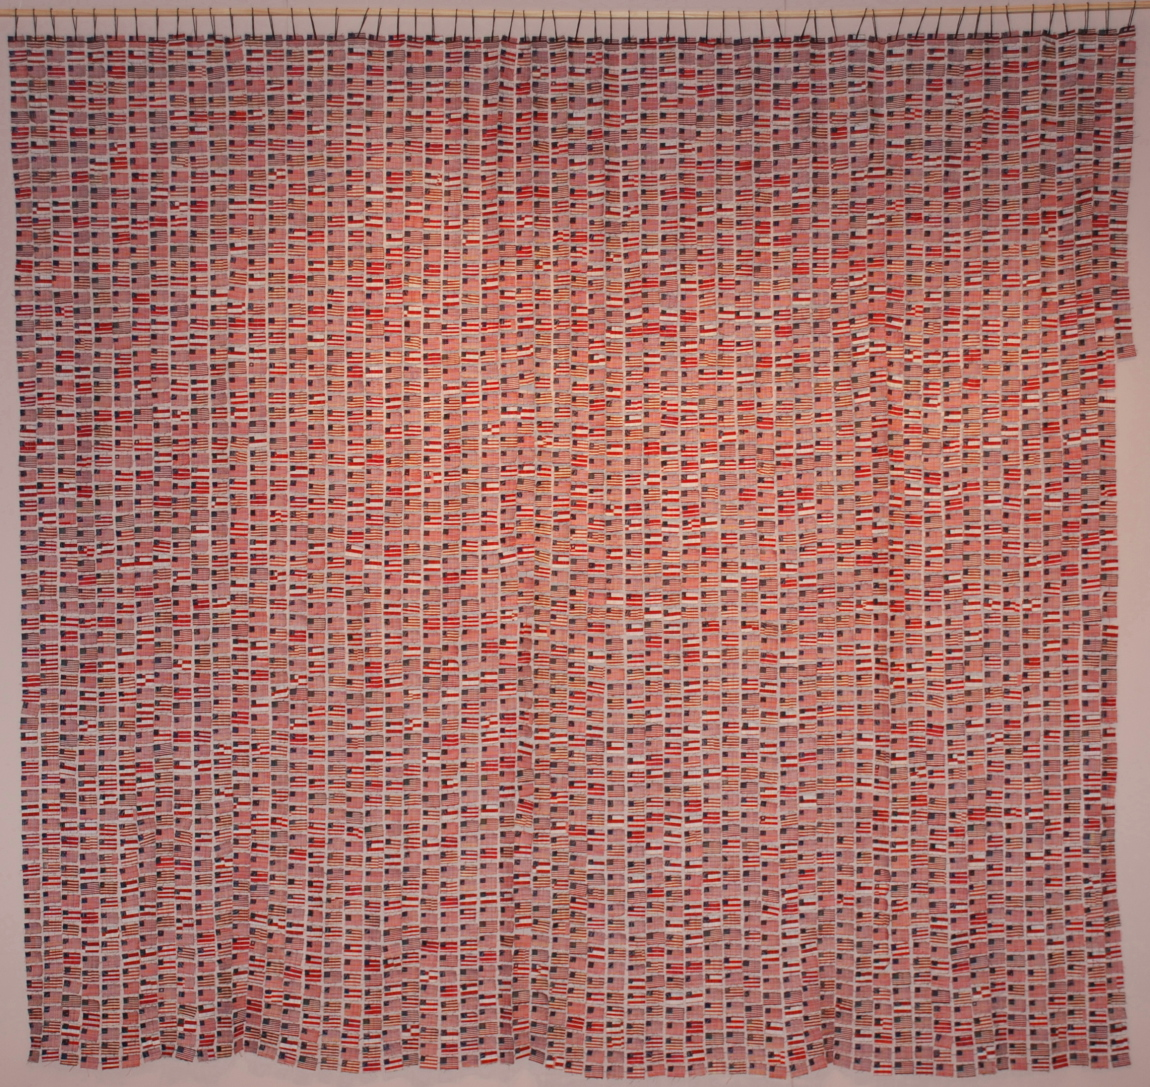 """Postage 3: Memorial Day"" by Kathleen Loomis, 86x100in, fiber (2008) NFS"